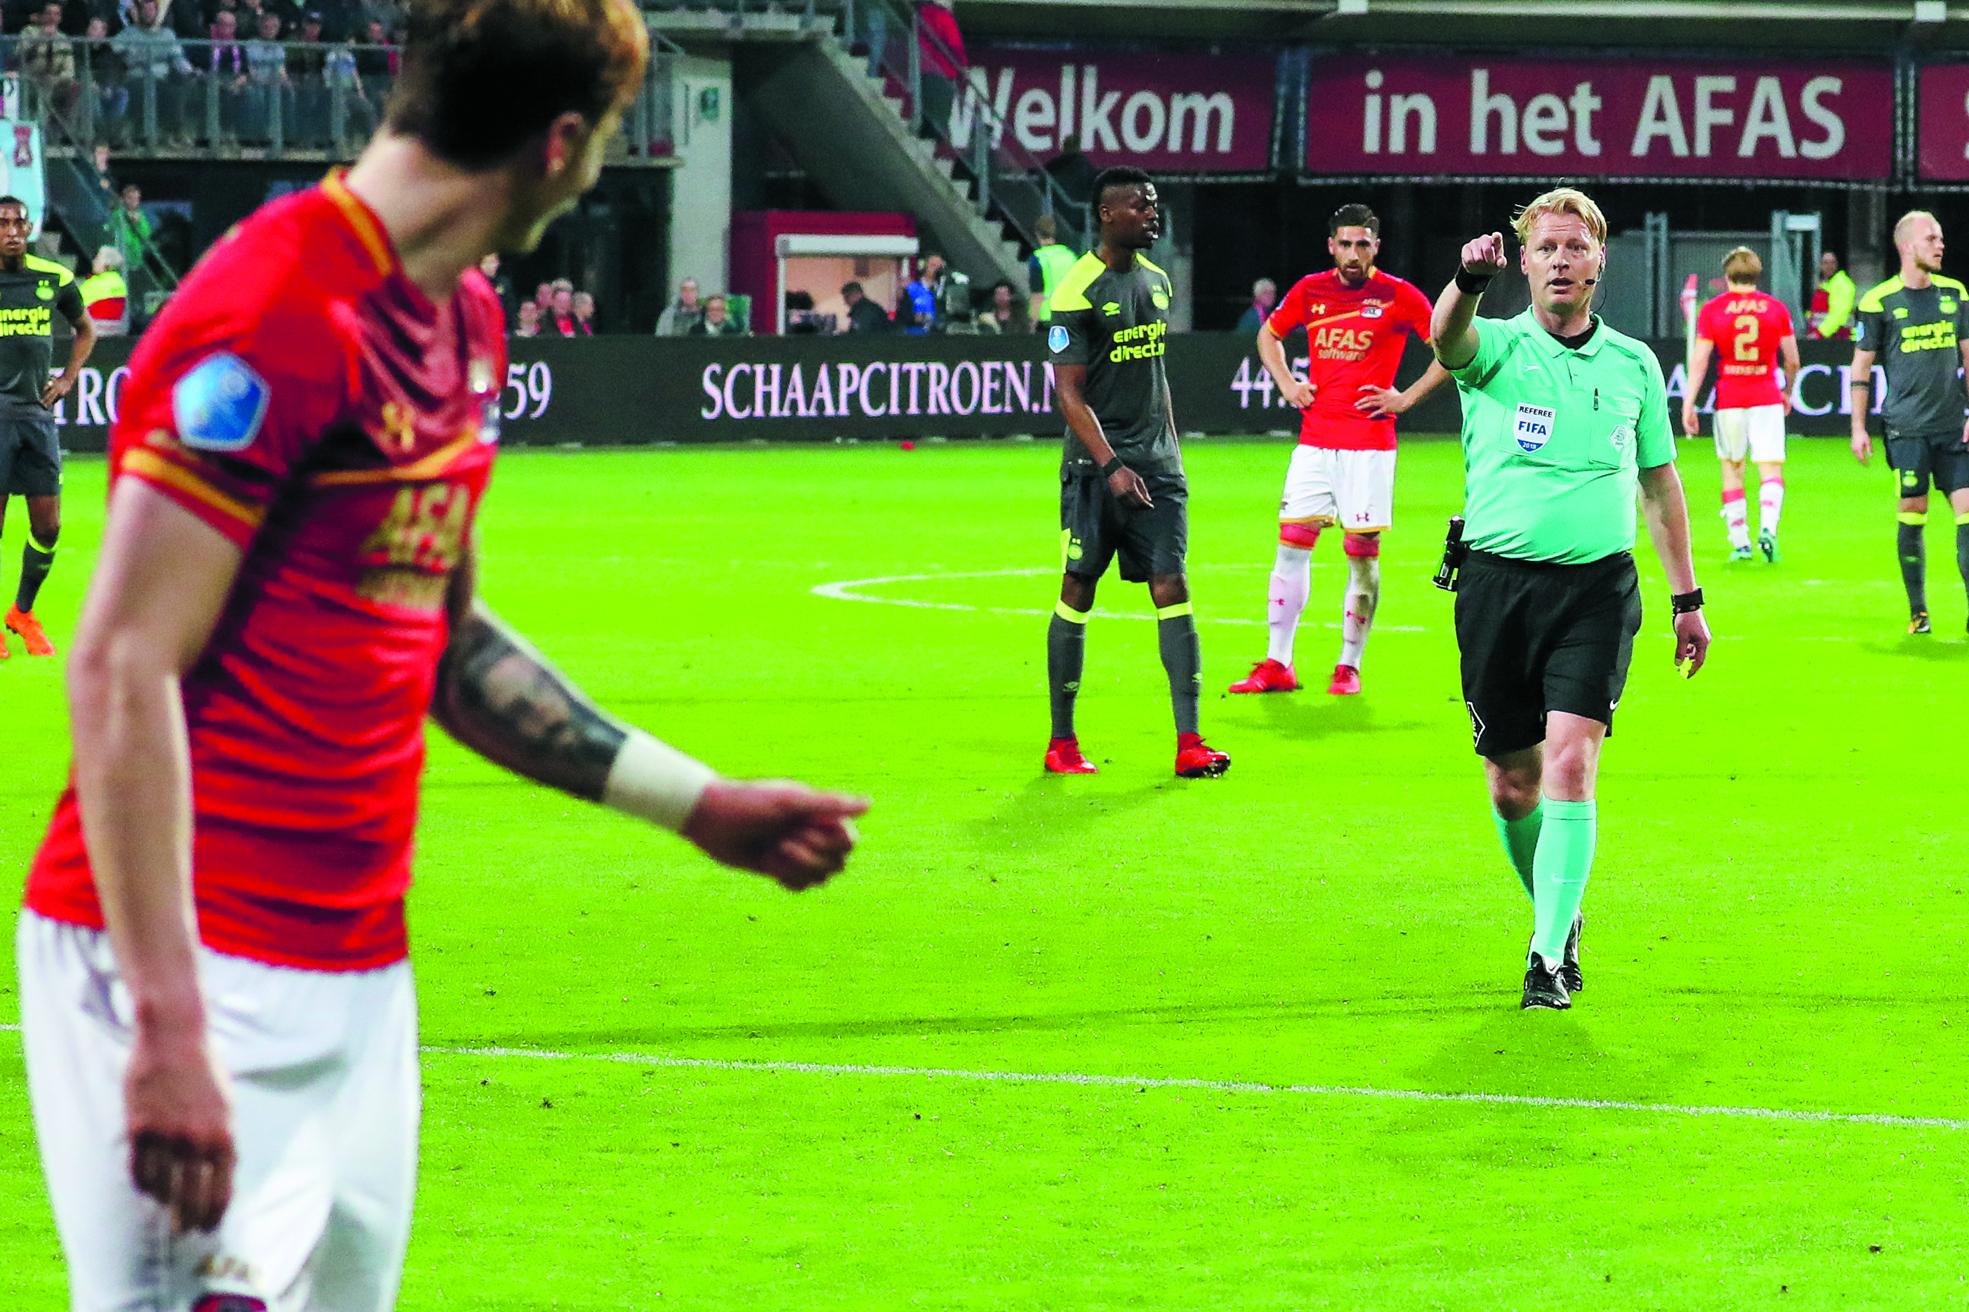 Kevin Blom en AZ: allesbehalve dikke vrienden. Kijk voor het fotoverslag op rodi.nl. (Foto: Vincent de Vries/RM)